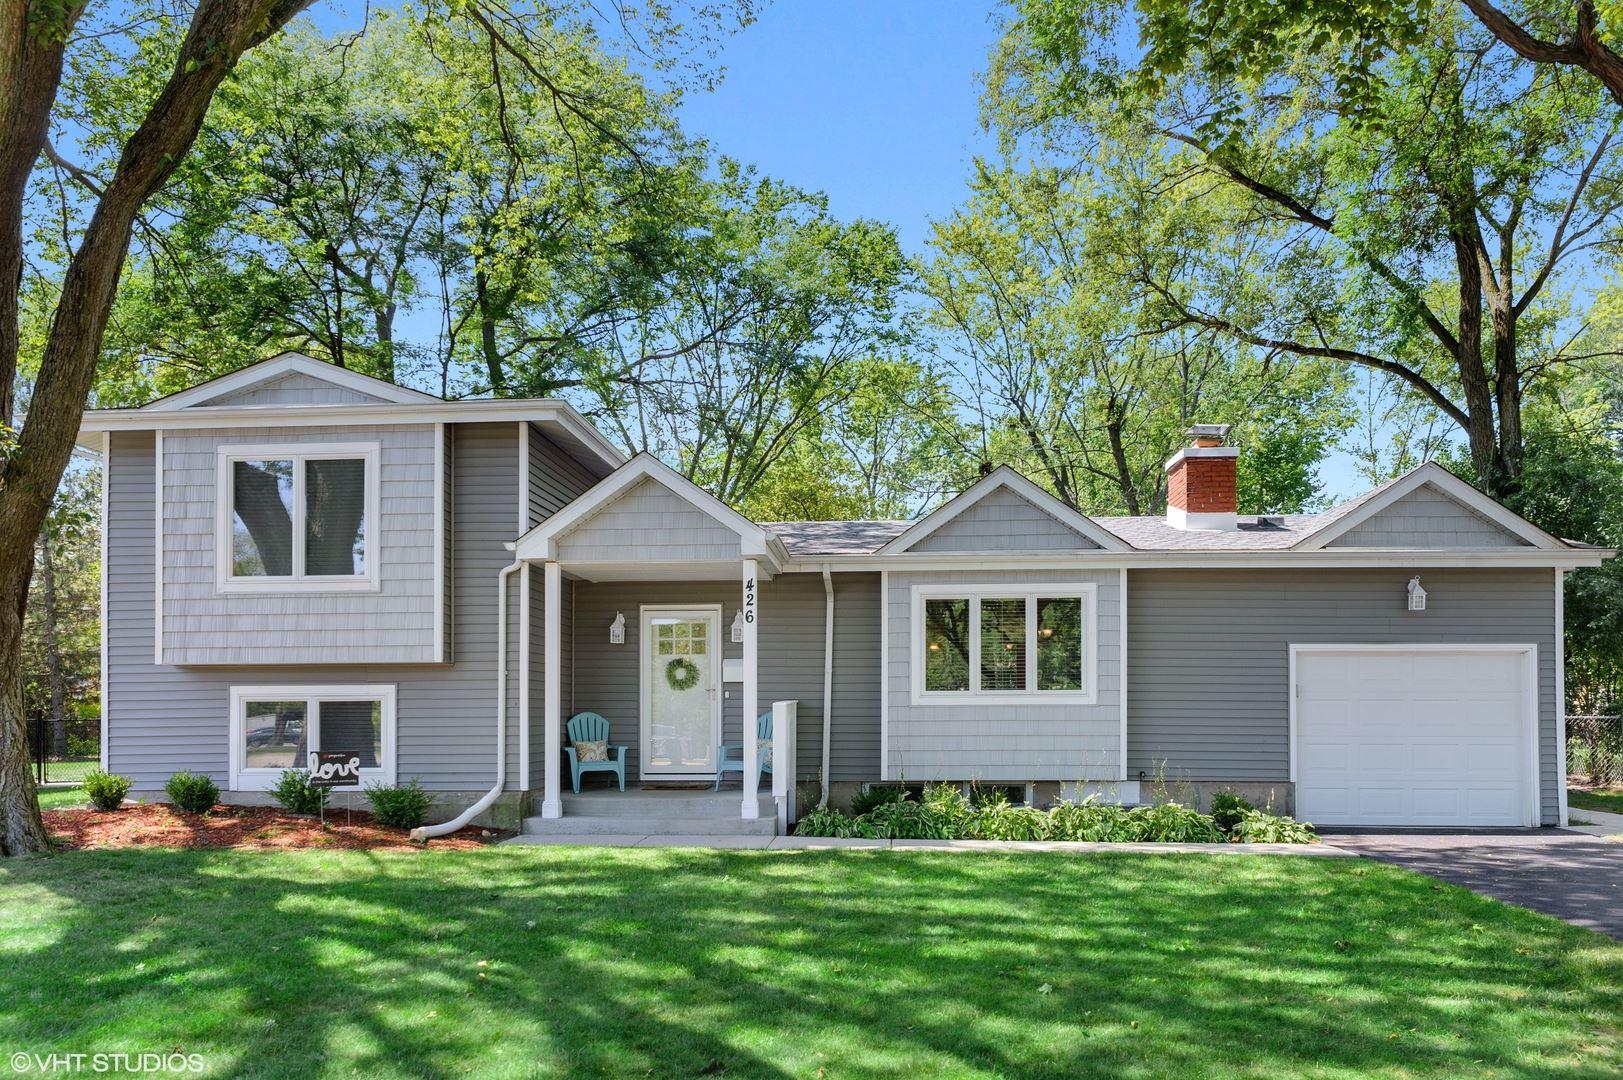 426 Pine Street, Deerfield, IL 60015 - #: 10805741